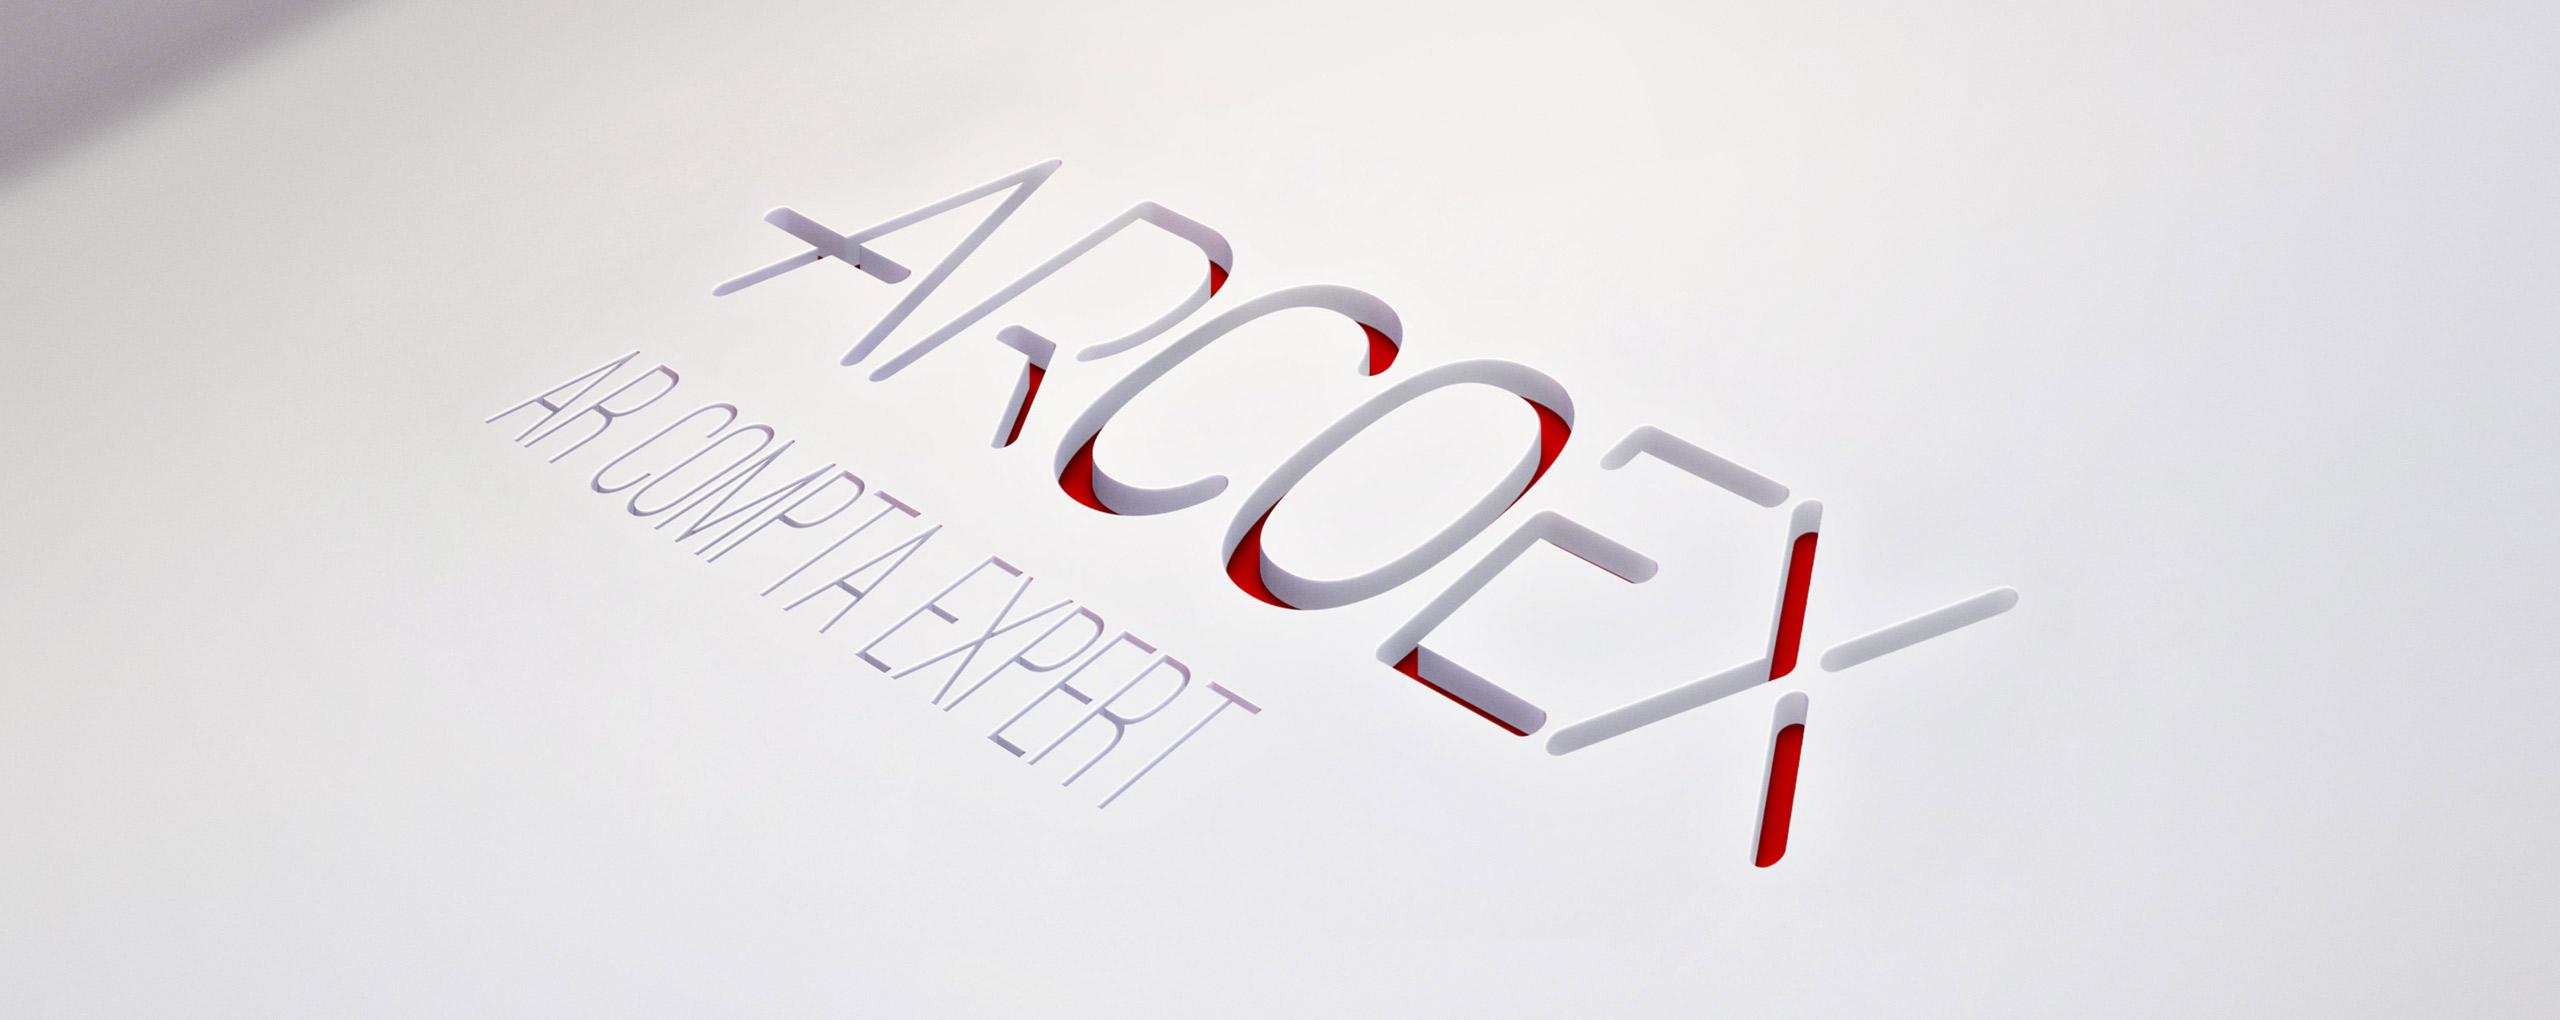 Arcoex